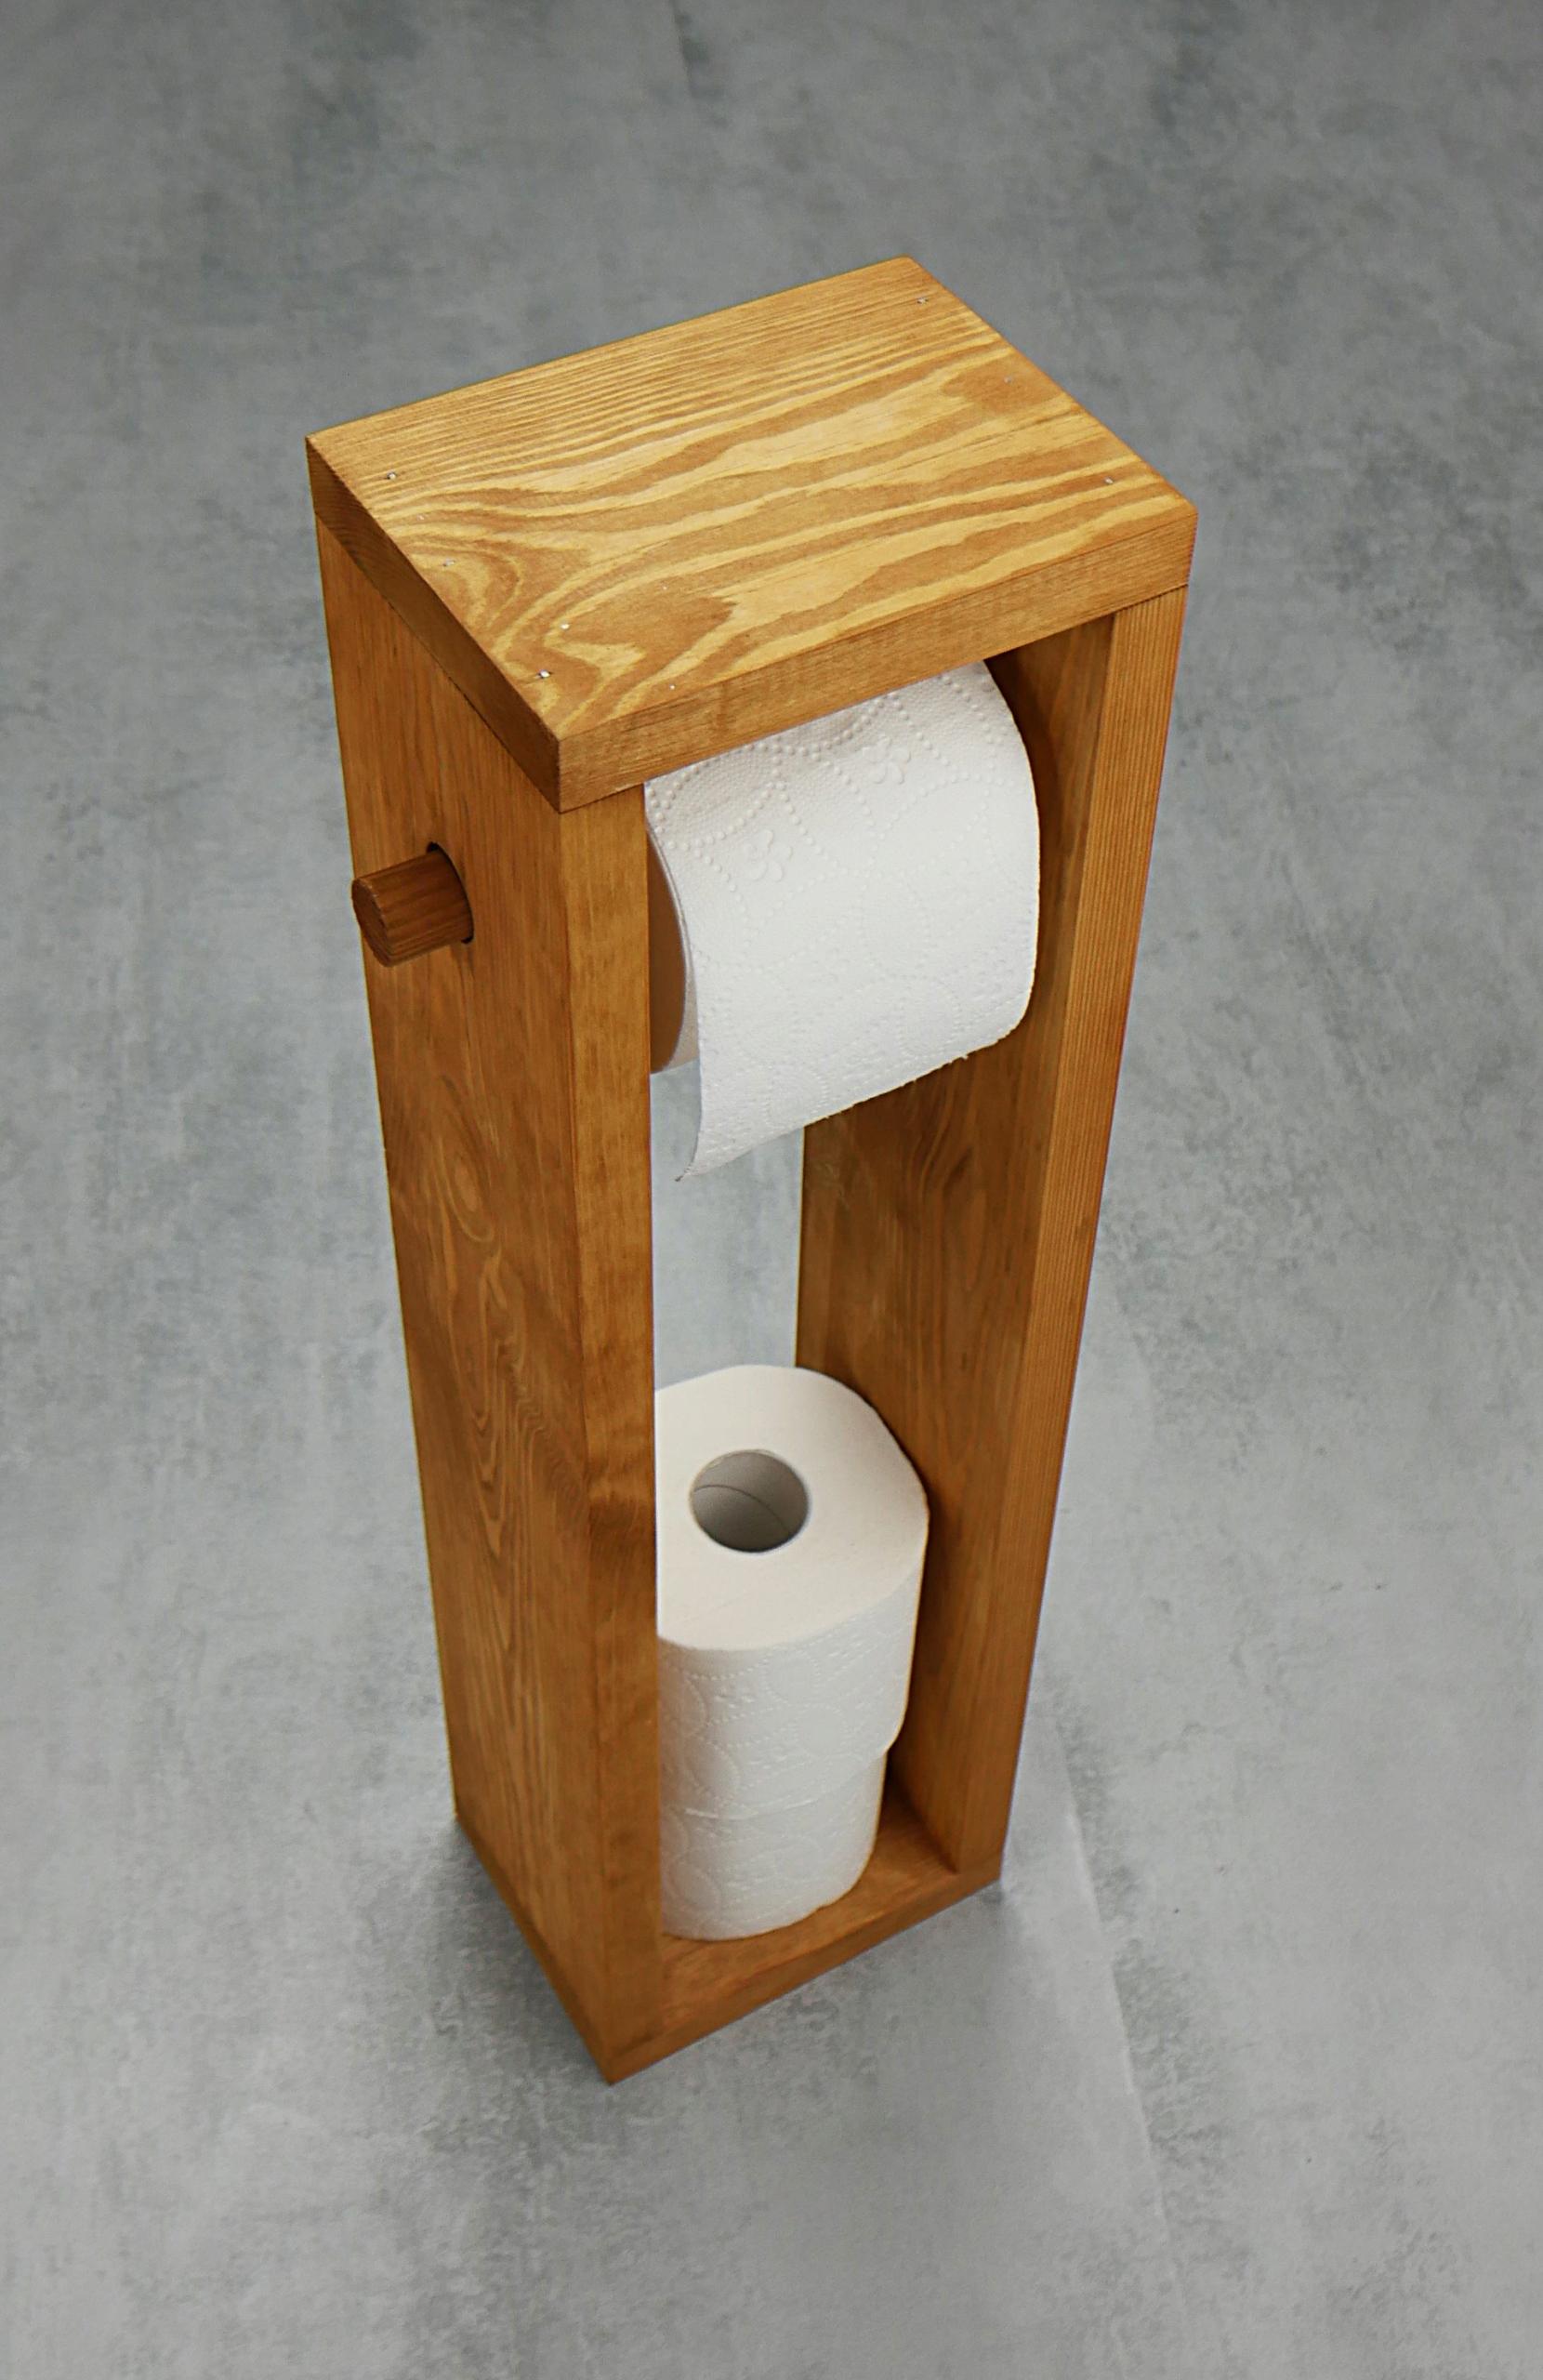 Drevené toaletného papiera držiak organizér